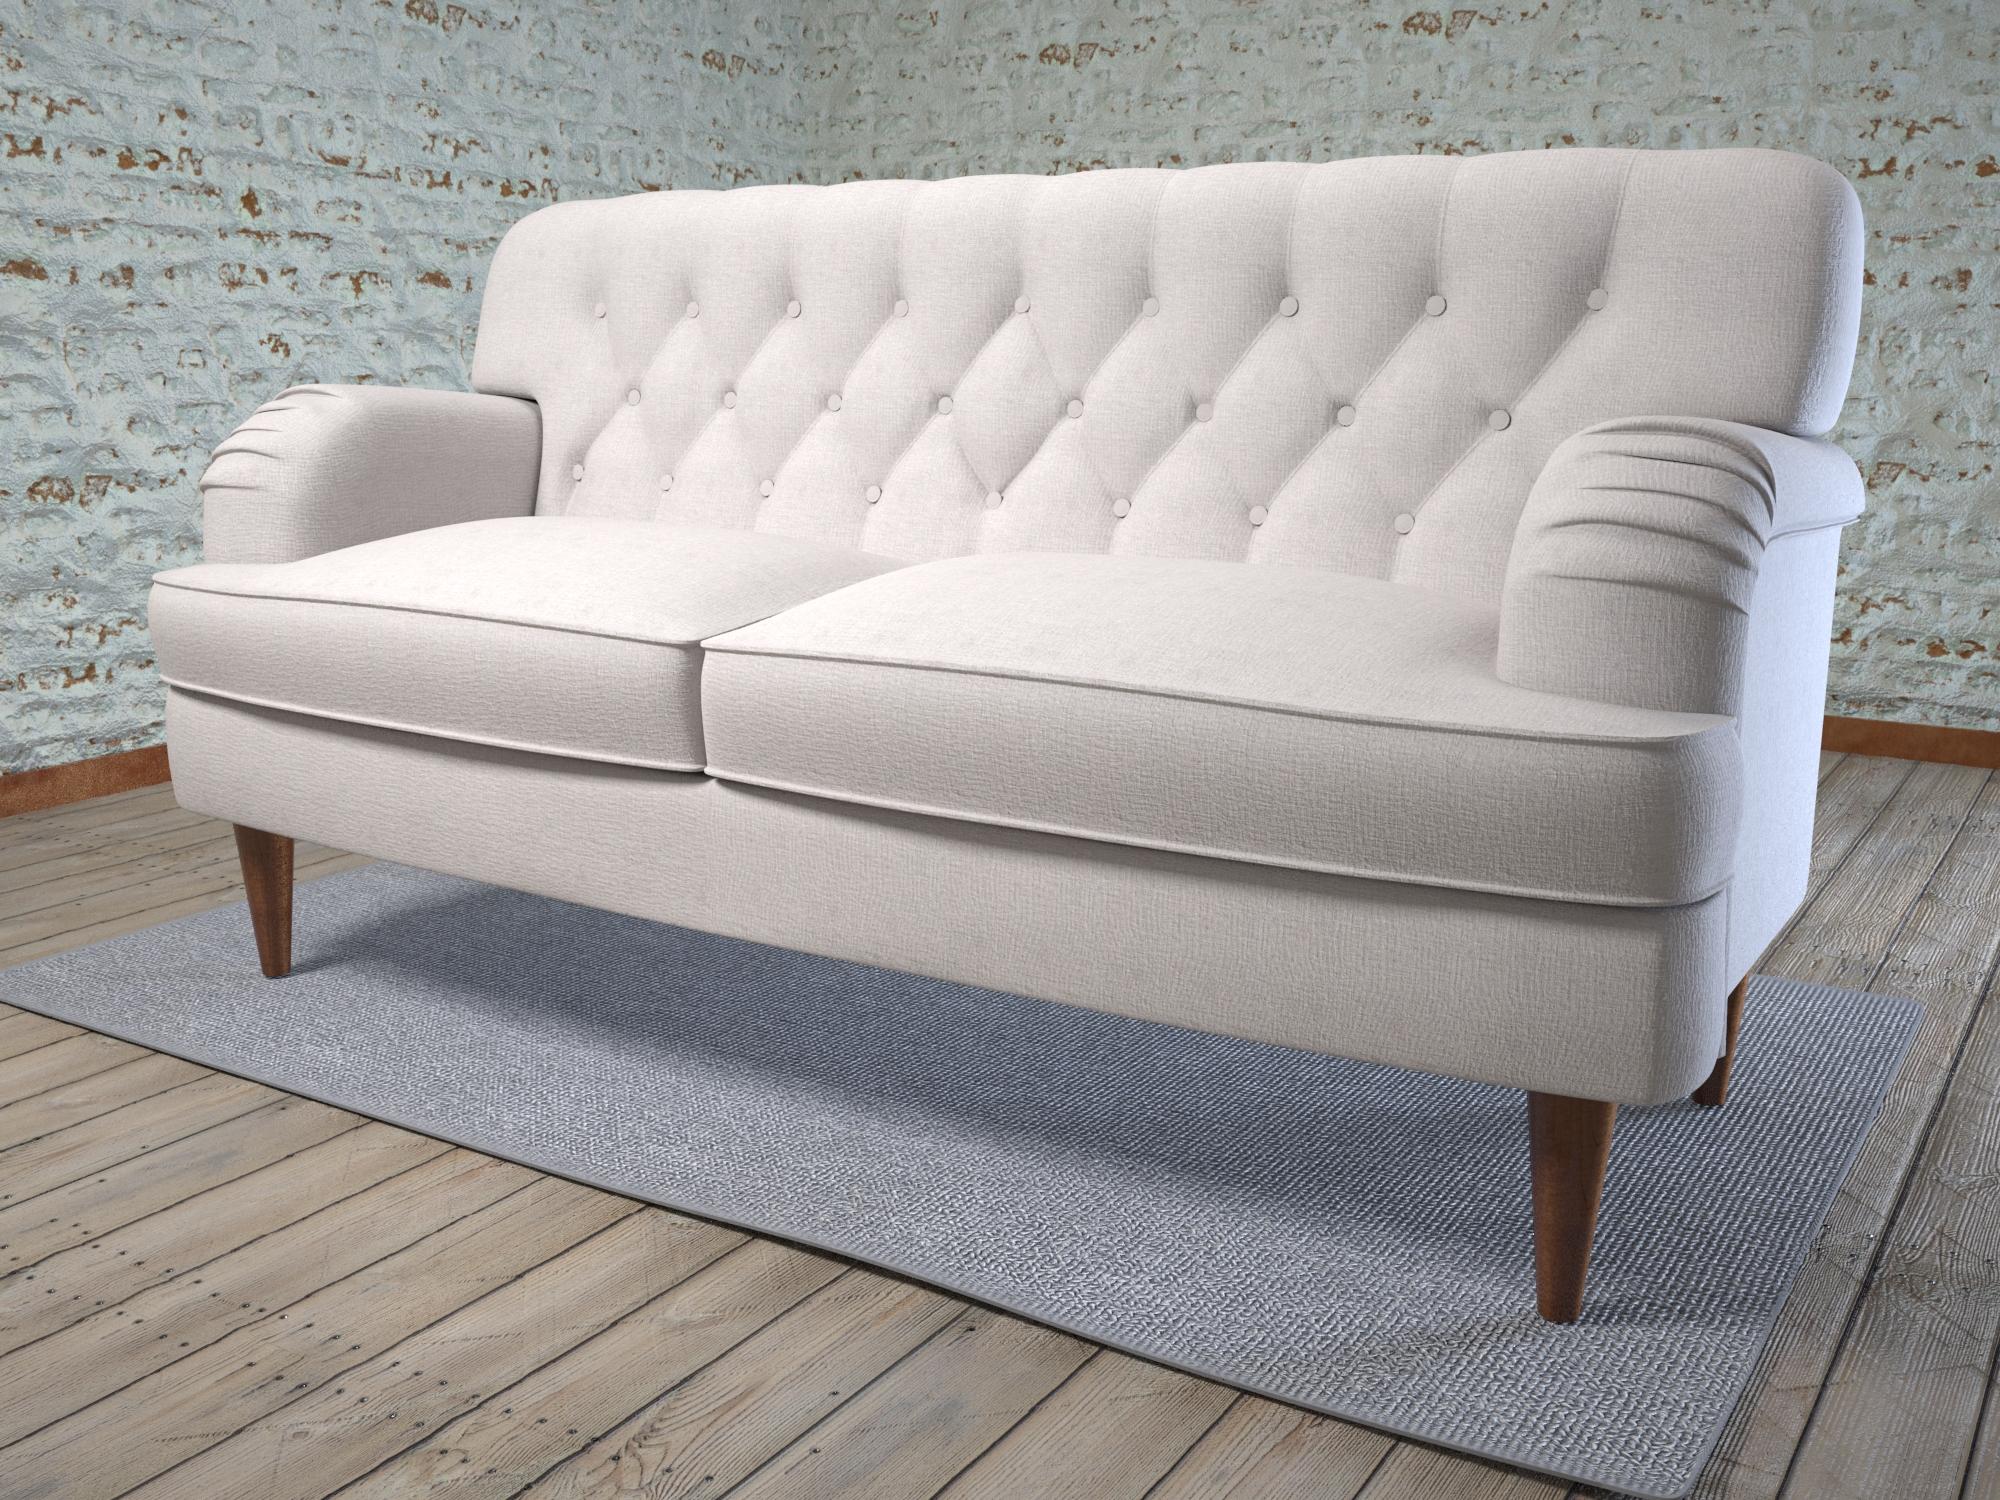 Sofa_texture